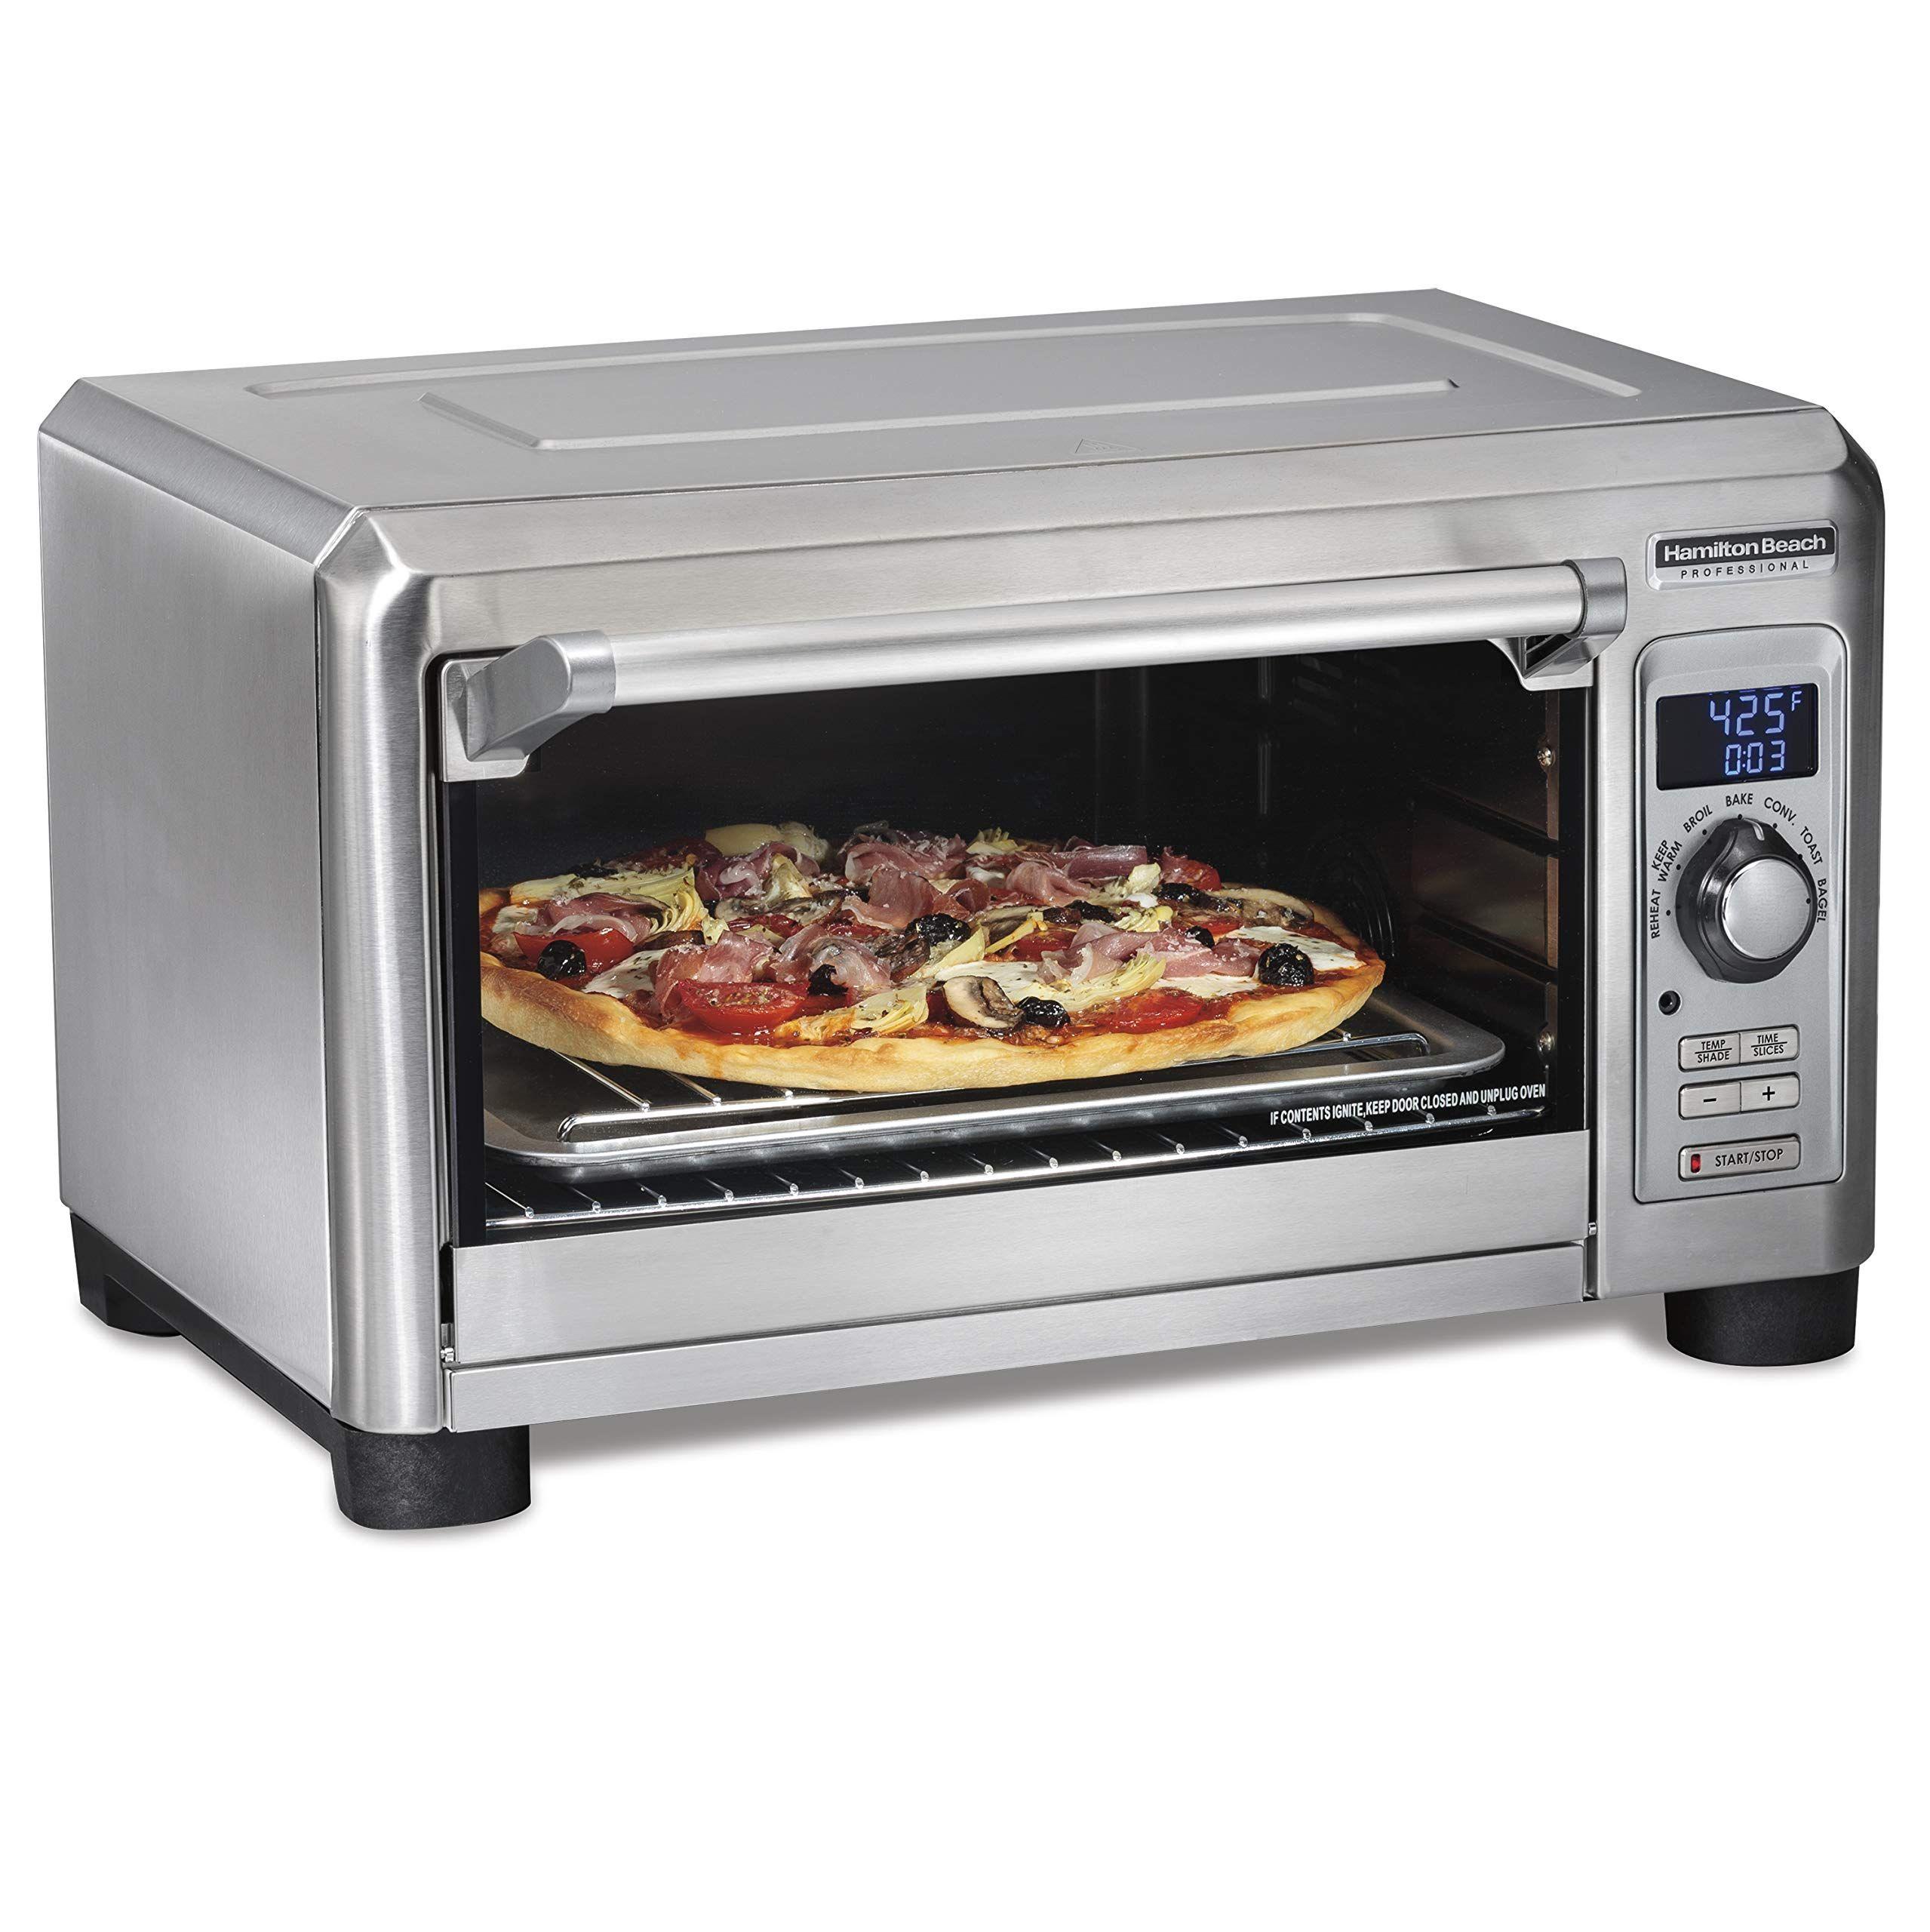 Hamilton Beach 31240 Professional Toaster Countertop Oven